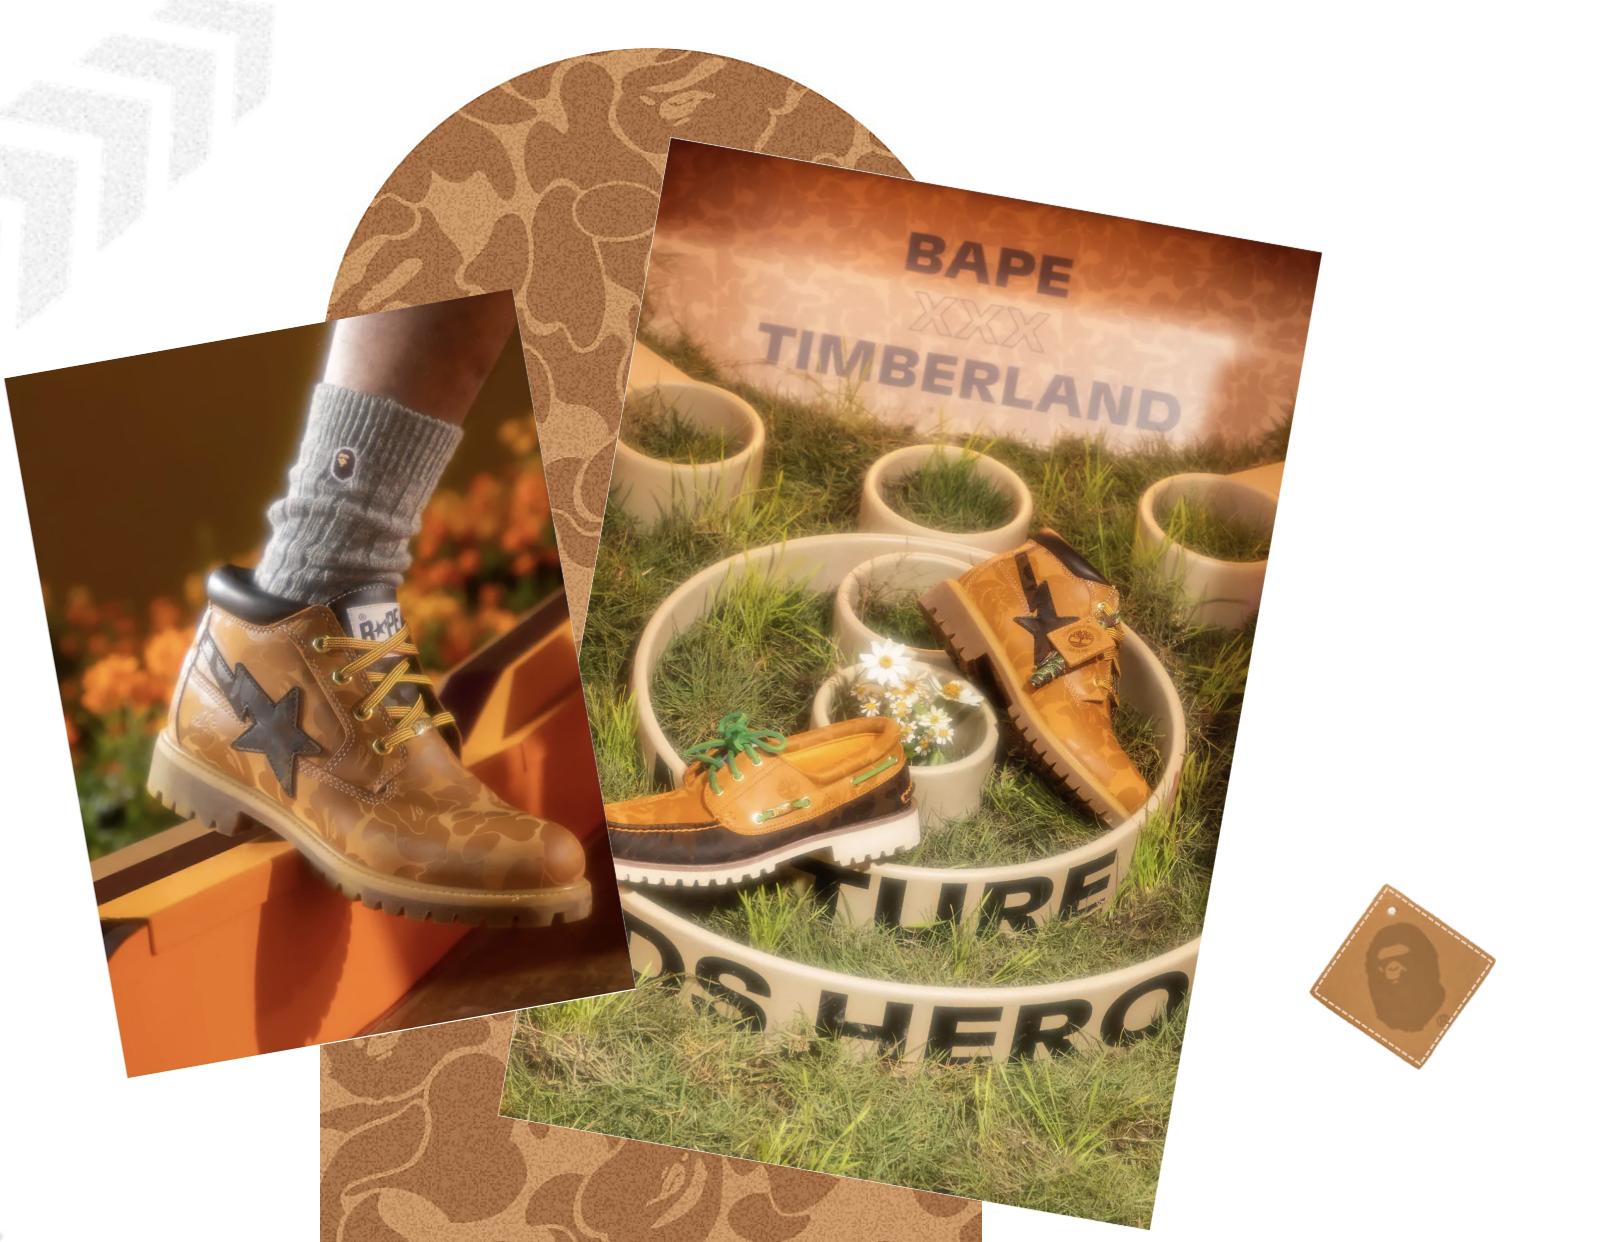 BAPE, Timberland, Lappoms, Lifestyle Blog